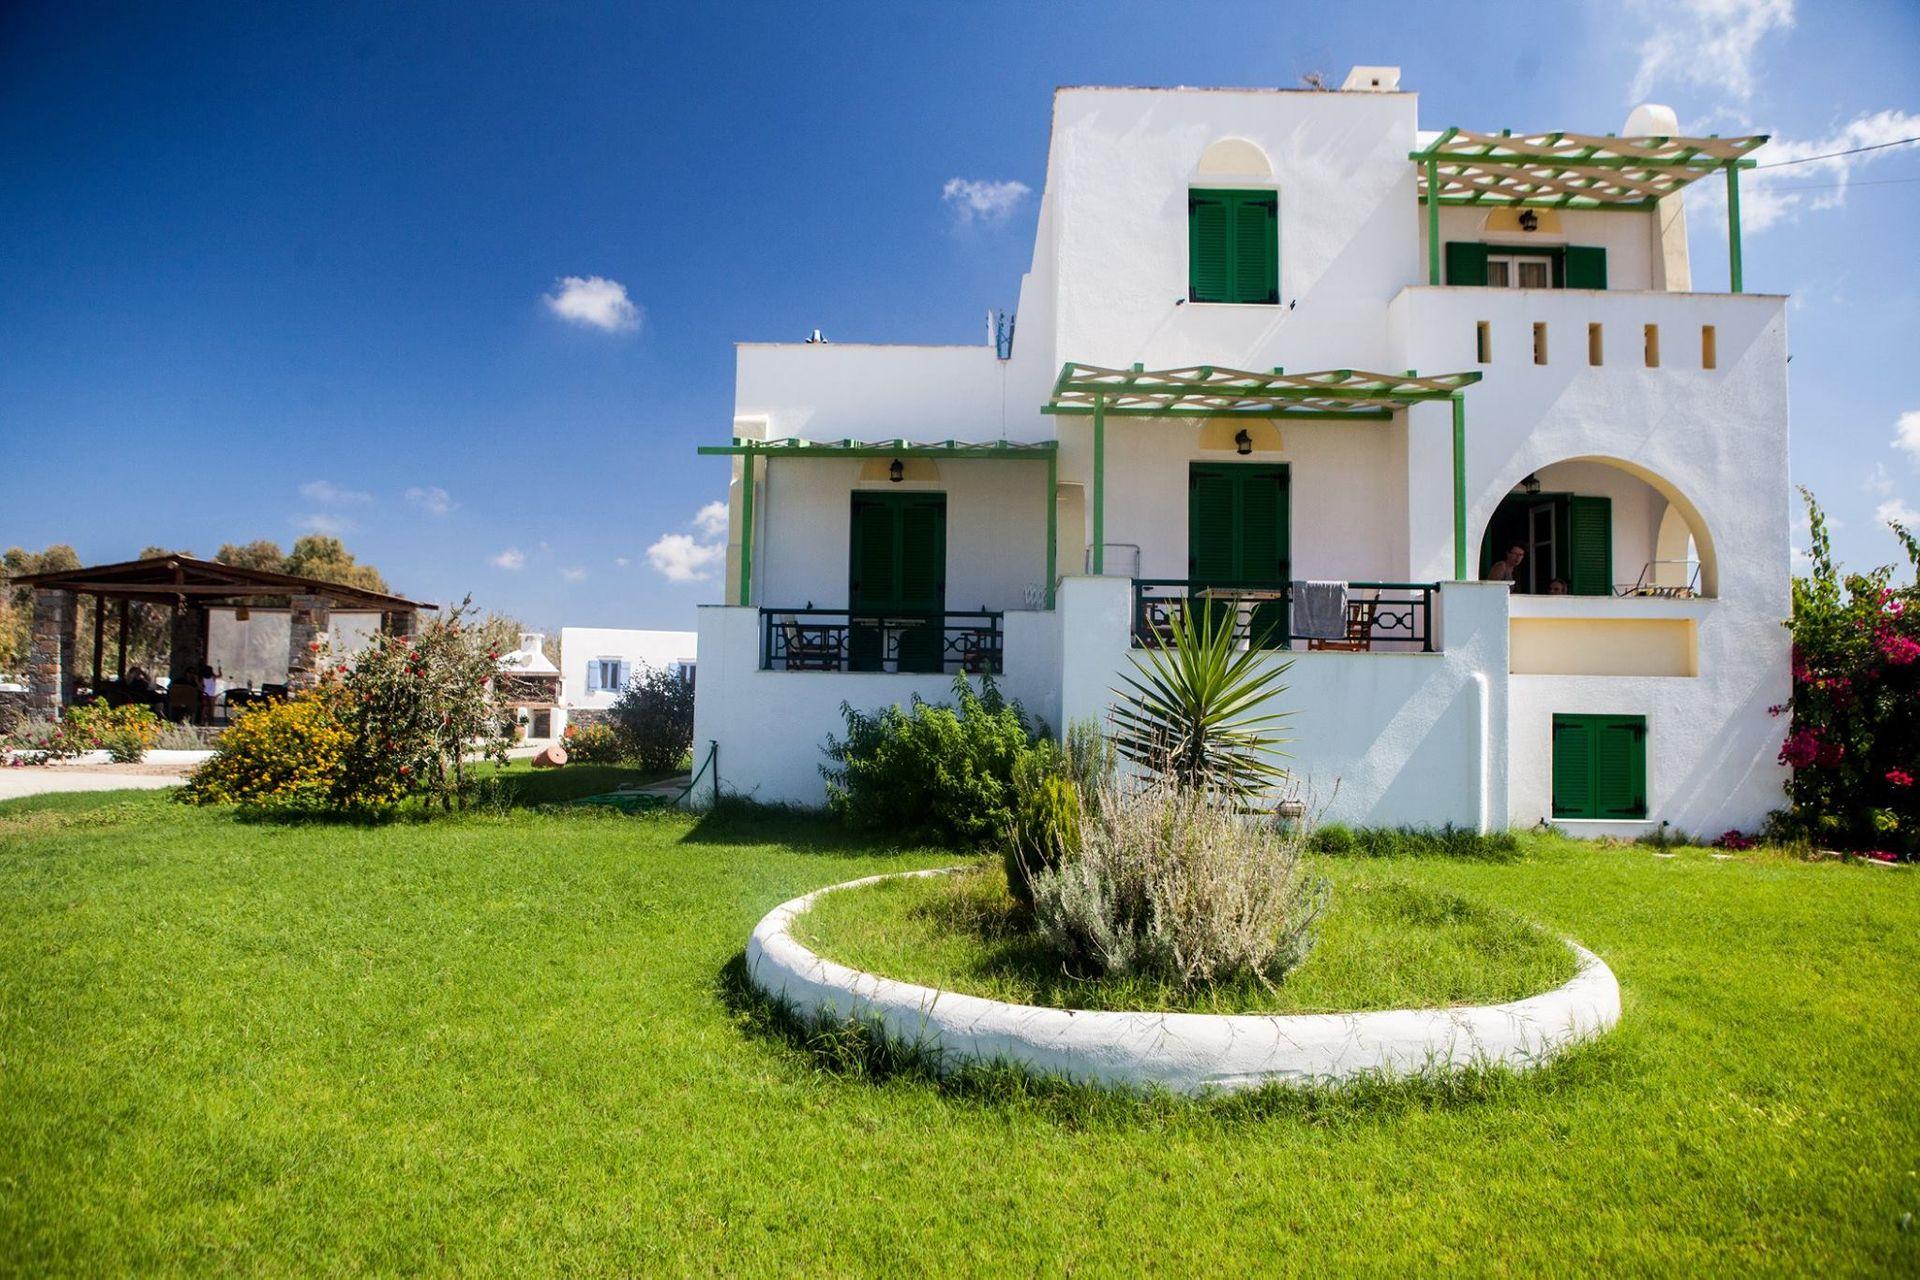 Villa Veranda Naxos - Νάξος ✦ 3 Ημέρες (2 Διανυκτερεύσεις) ✦ 4 άτομα ✦ Χωρίς Πρωινό ✦ 01/09/2020 έως 19/09/2020 ✦ Κοντά σε Παραλία!